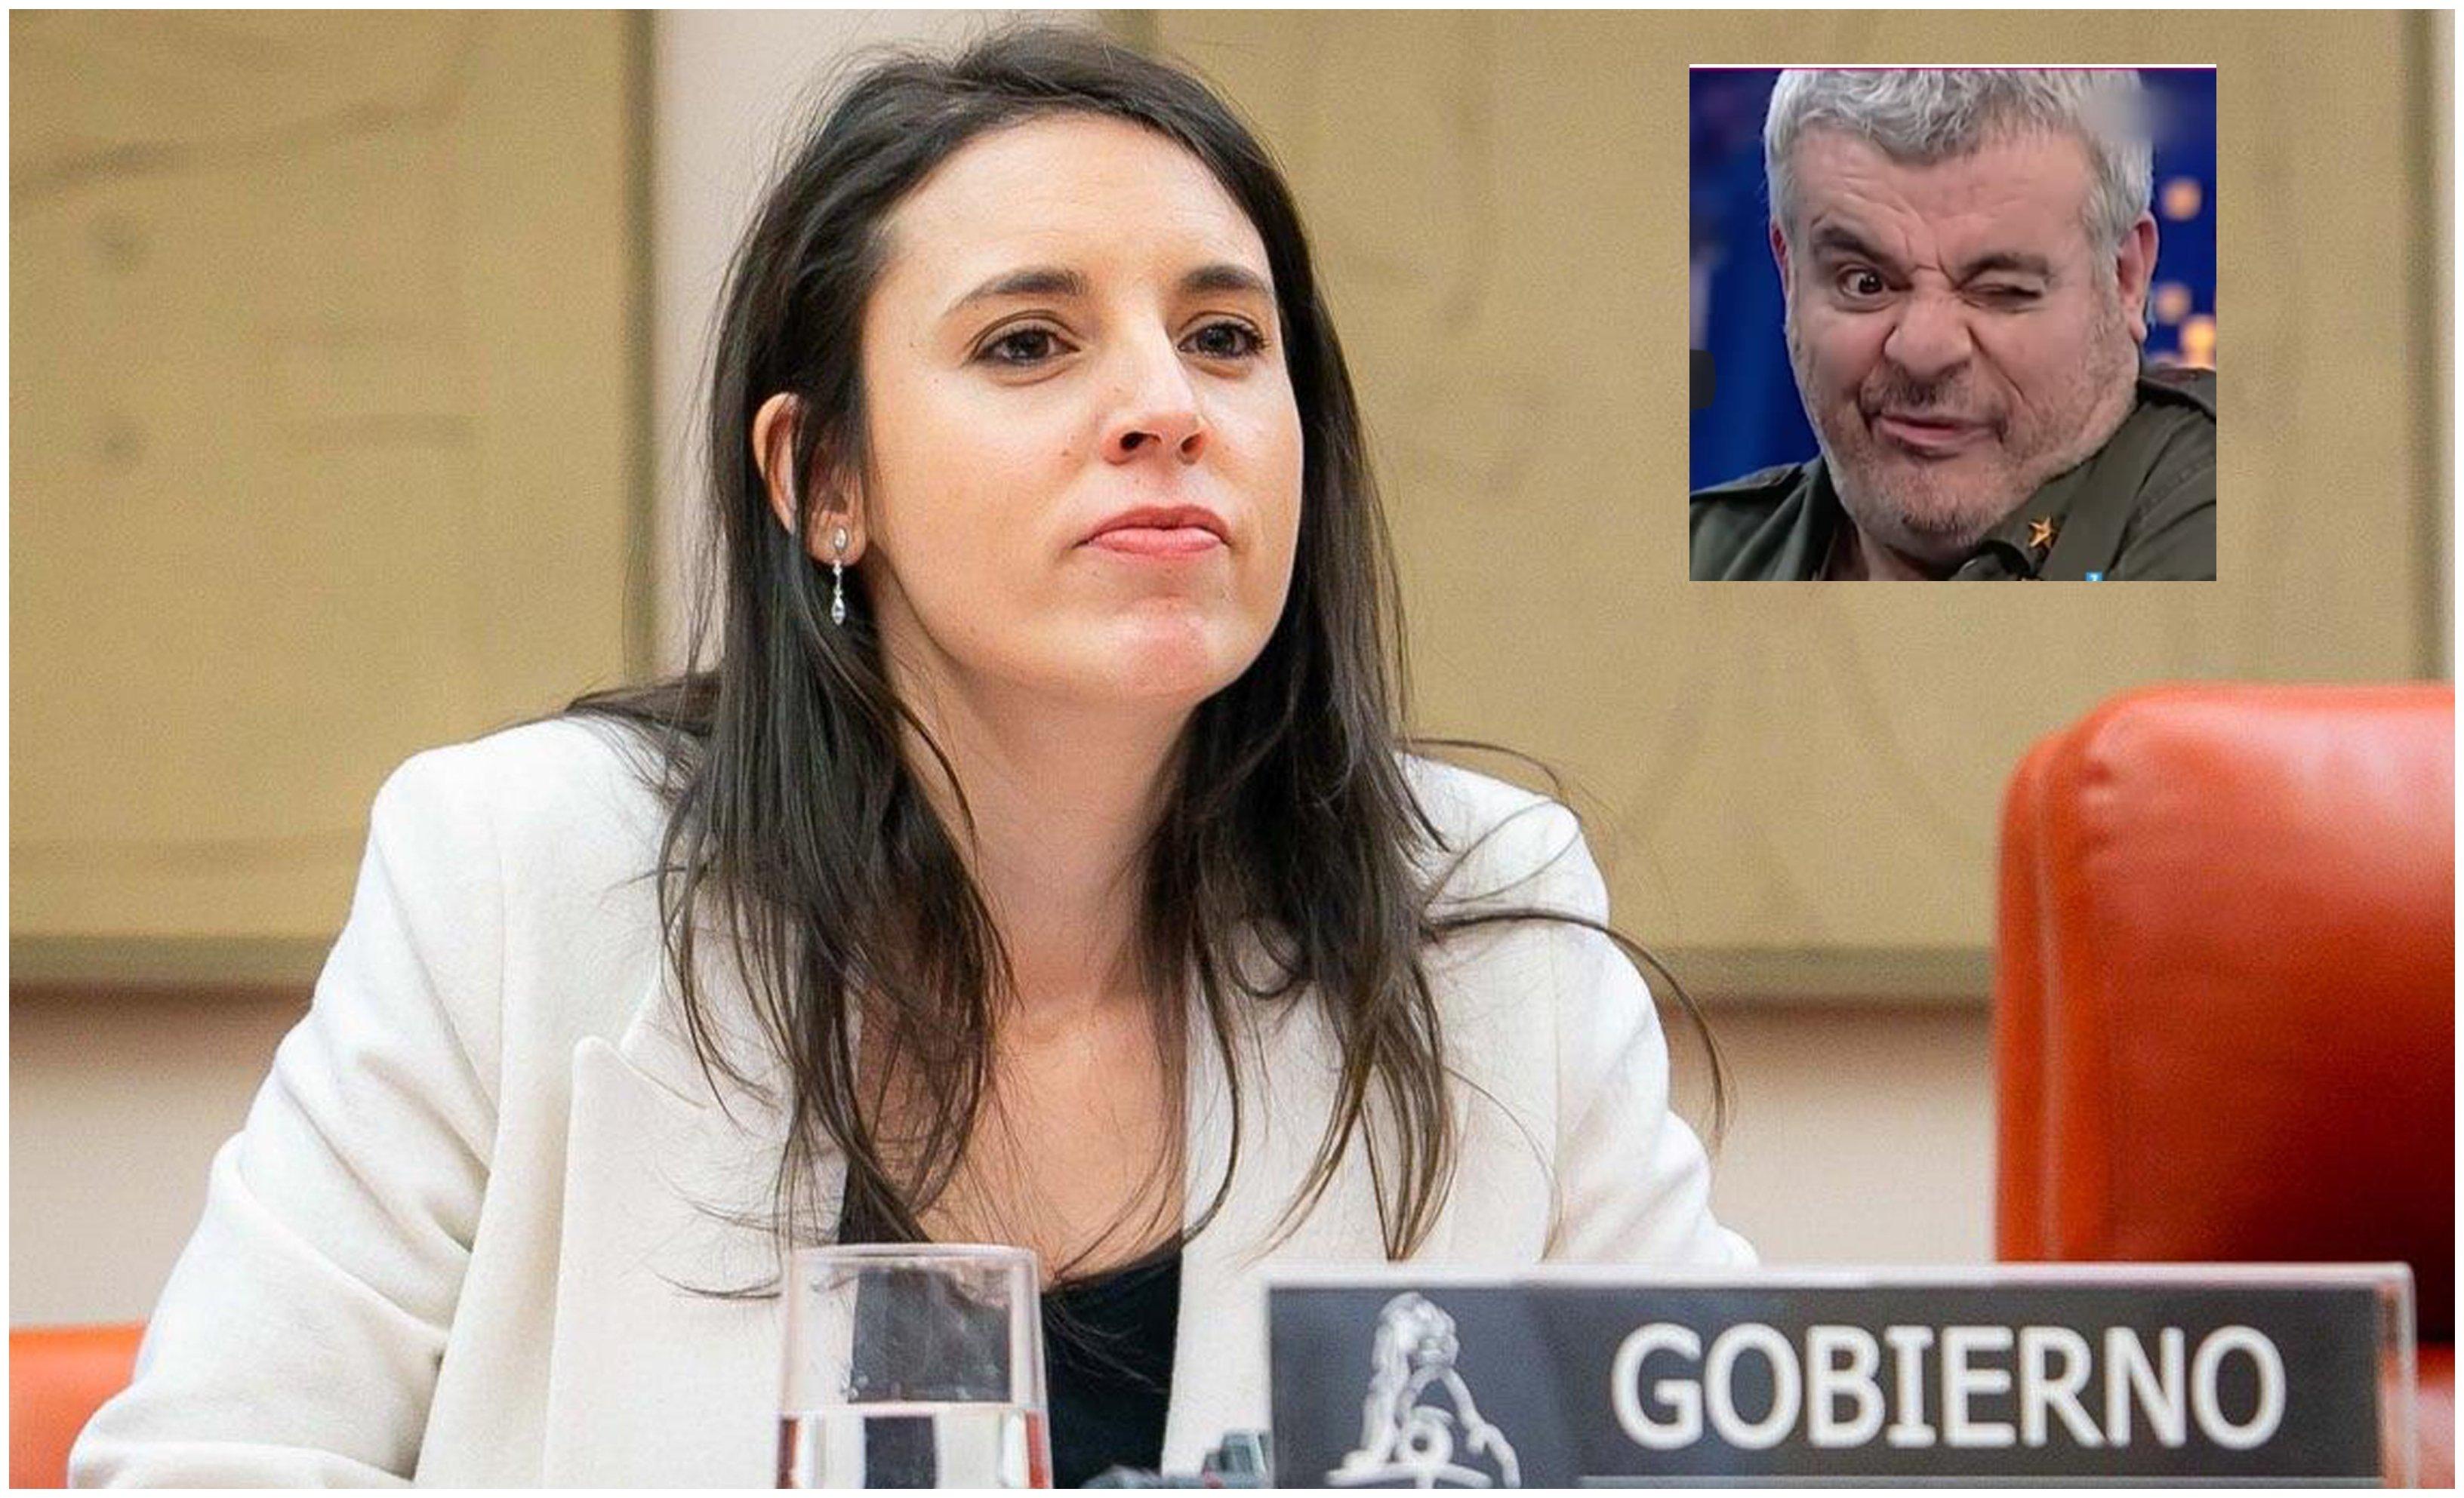 Irene Montero, ¡prrr!: A la ministra de Igualdad le preocupan la xenofobia, la islamofobia, el antisemitisno y el antigitanismo… la cristofobia, no. Esa pretende alentarla